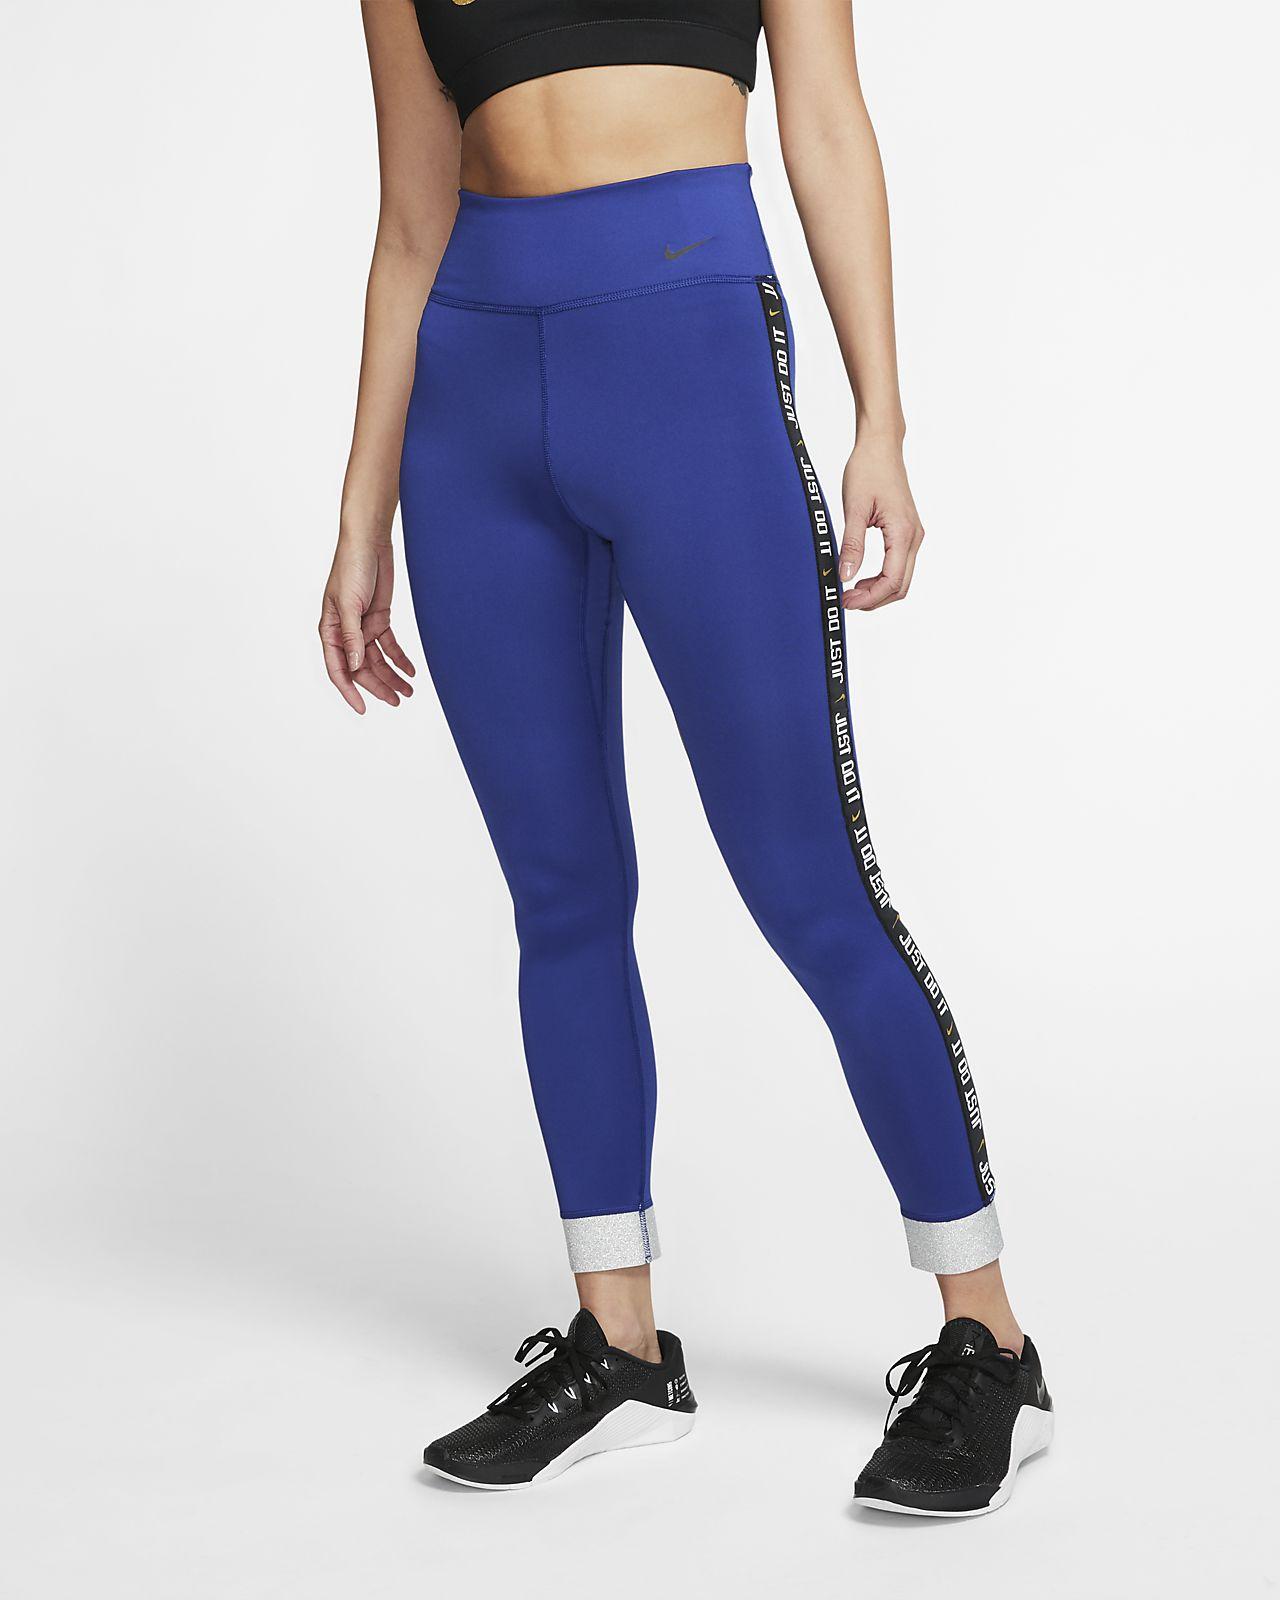 Nike One Icon Clash Women's 7/8 Training Tights